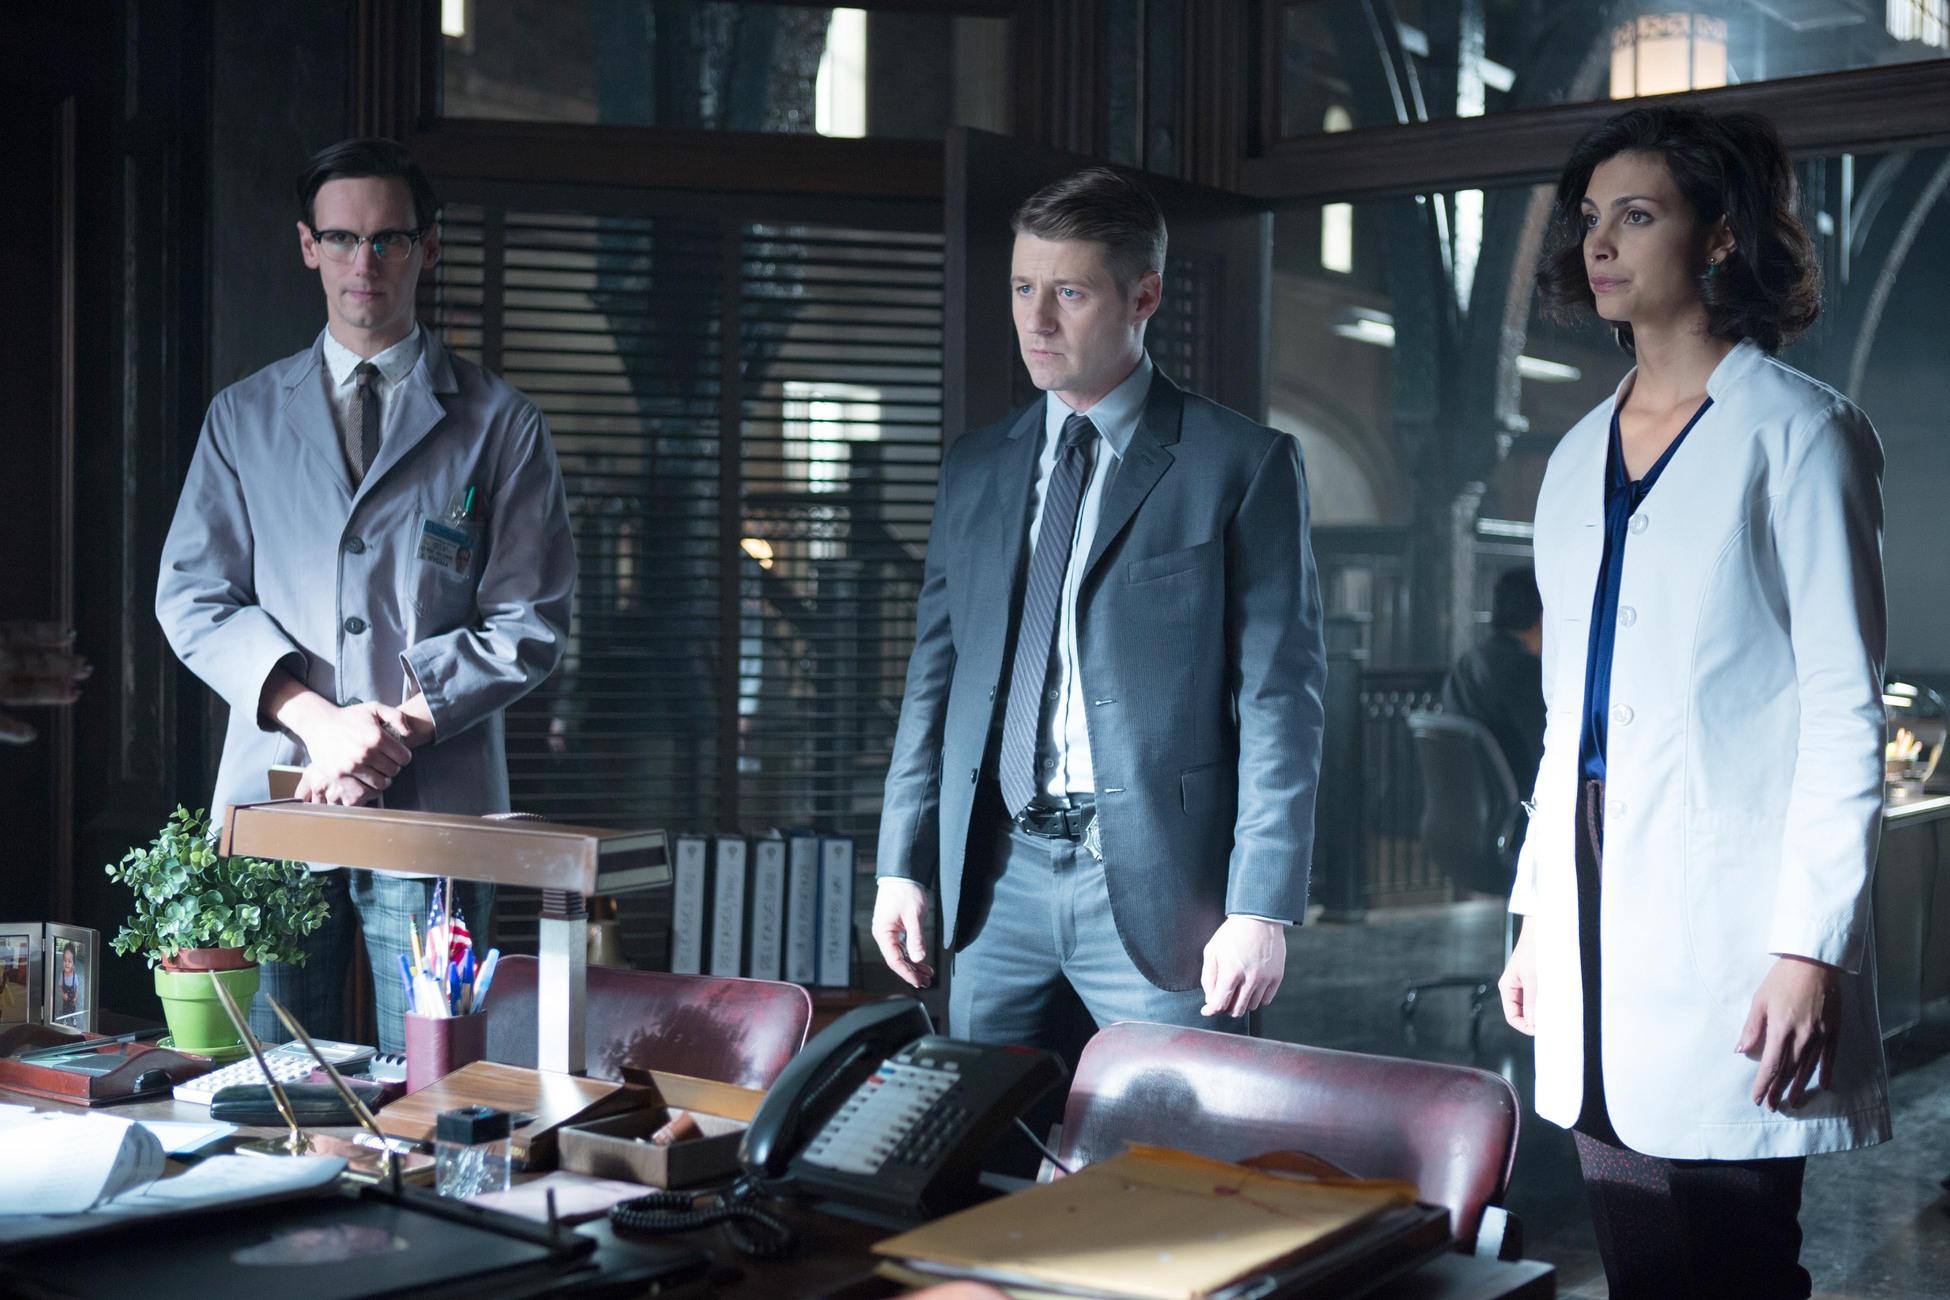 Gotham - Episode 1.16 - The Blind Fortune Teller